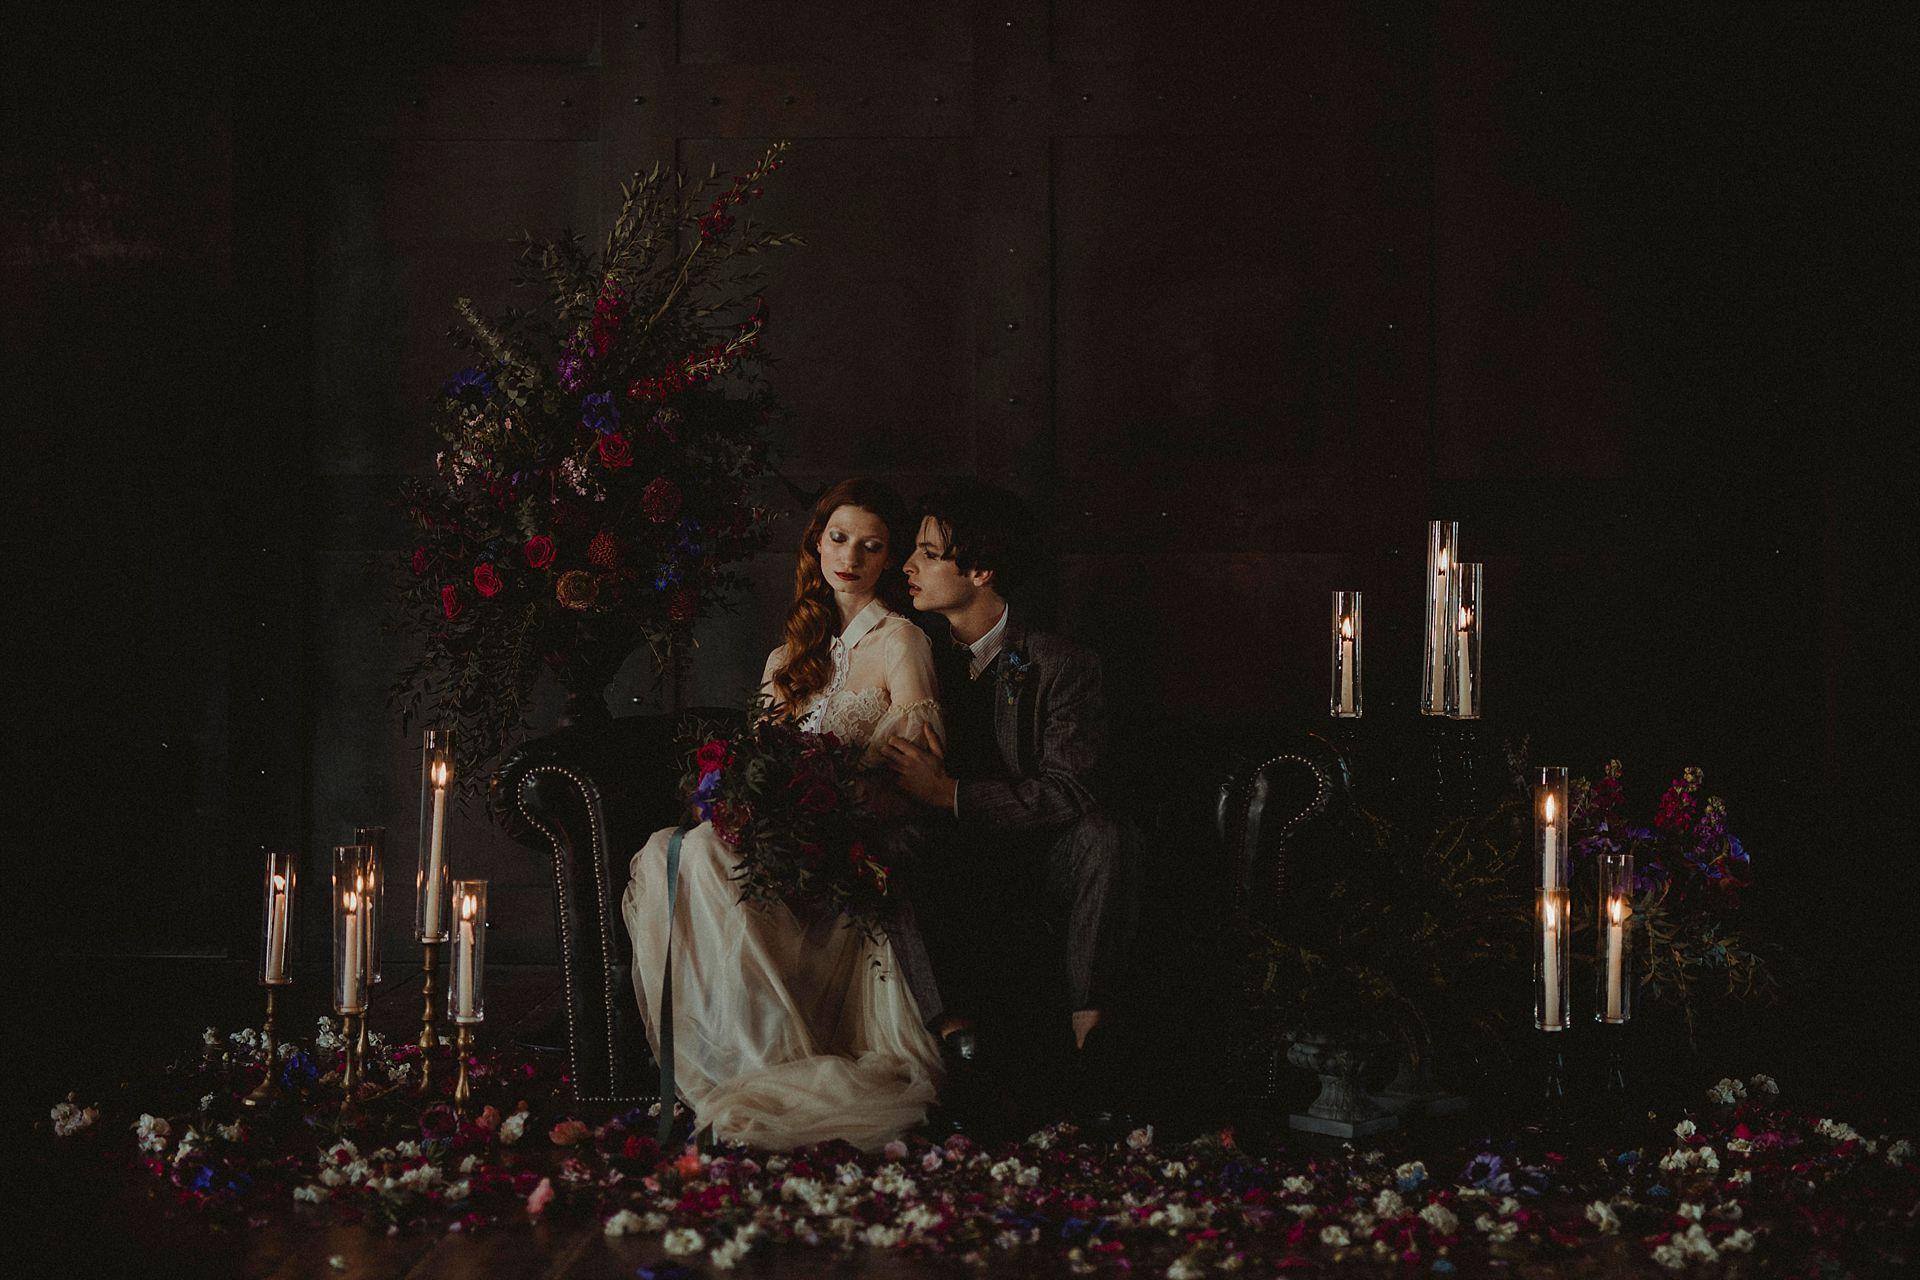 Decadent Wedding Inspiration- Moody Wedding Inspiration- Sudio Fotografico Bacci- Unconventional Wedding- elegant wedding- luxurious wedding photography